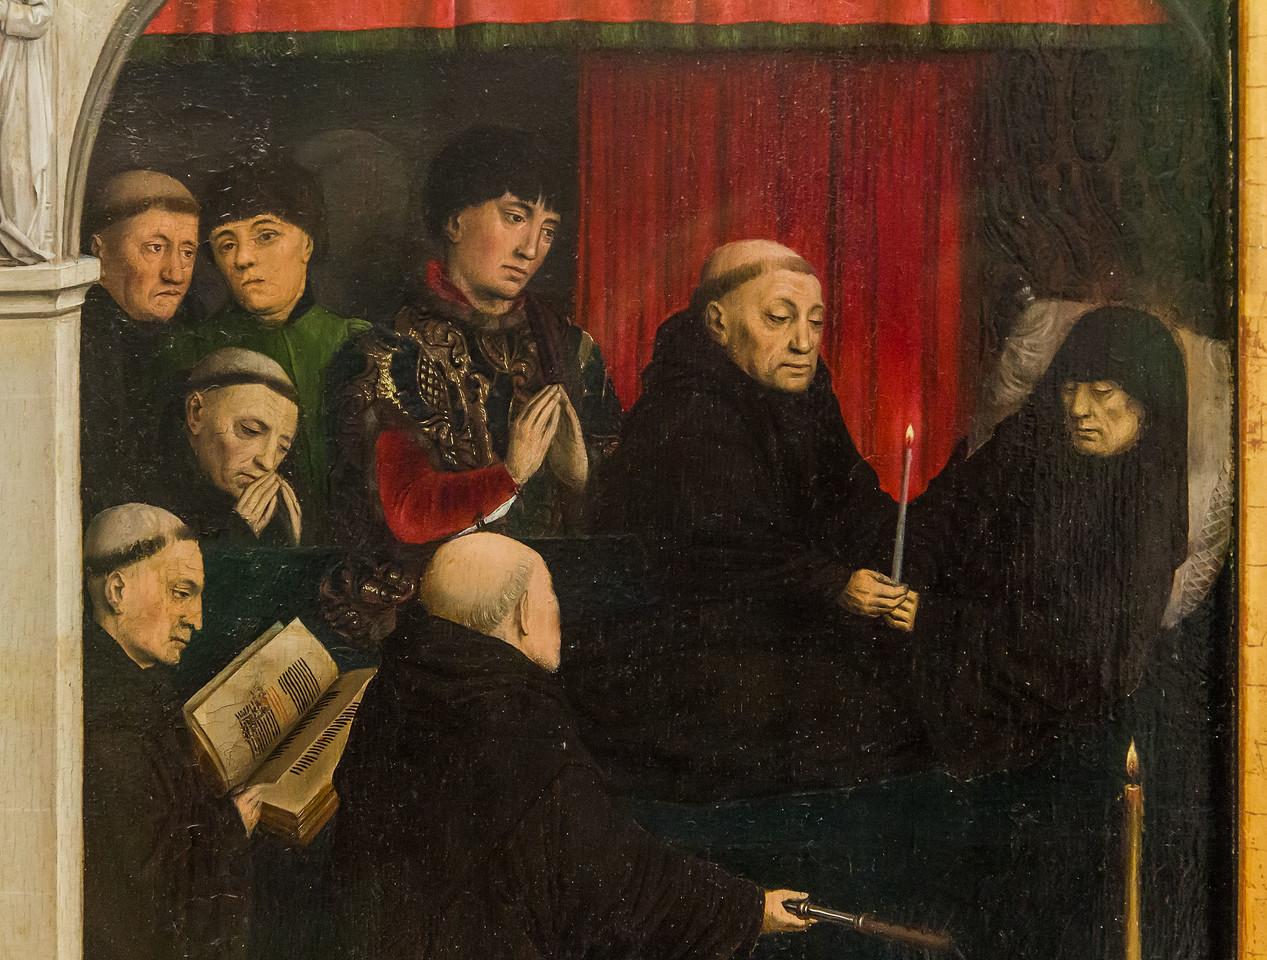 Simon Marmion: Omer-Retabel, Feld 10. Tod des Hl. Bertin [1459, Gemäldegalerie Berlin]